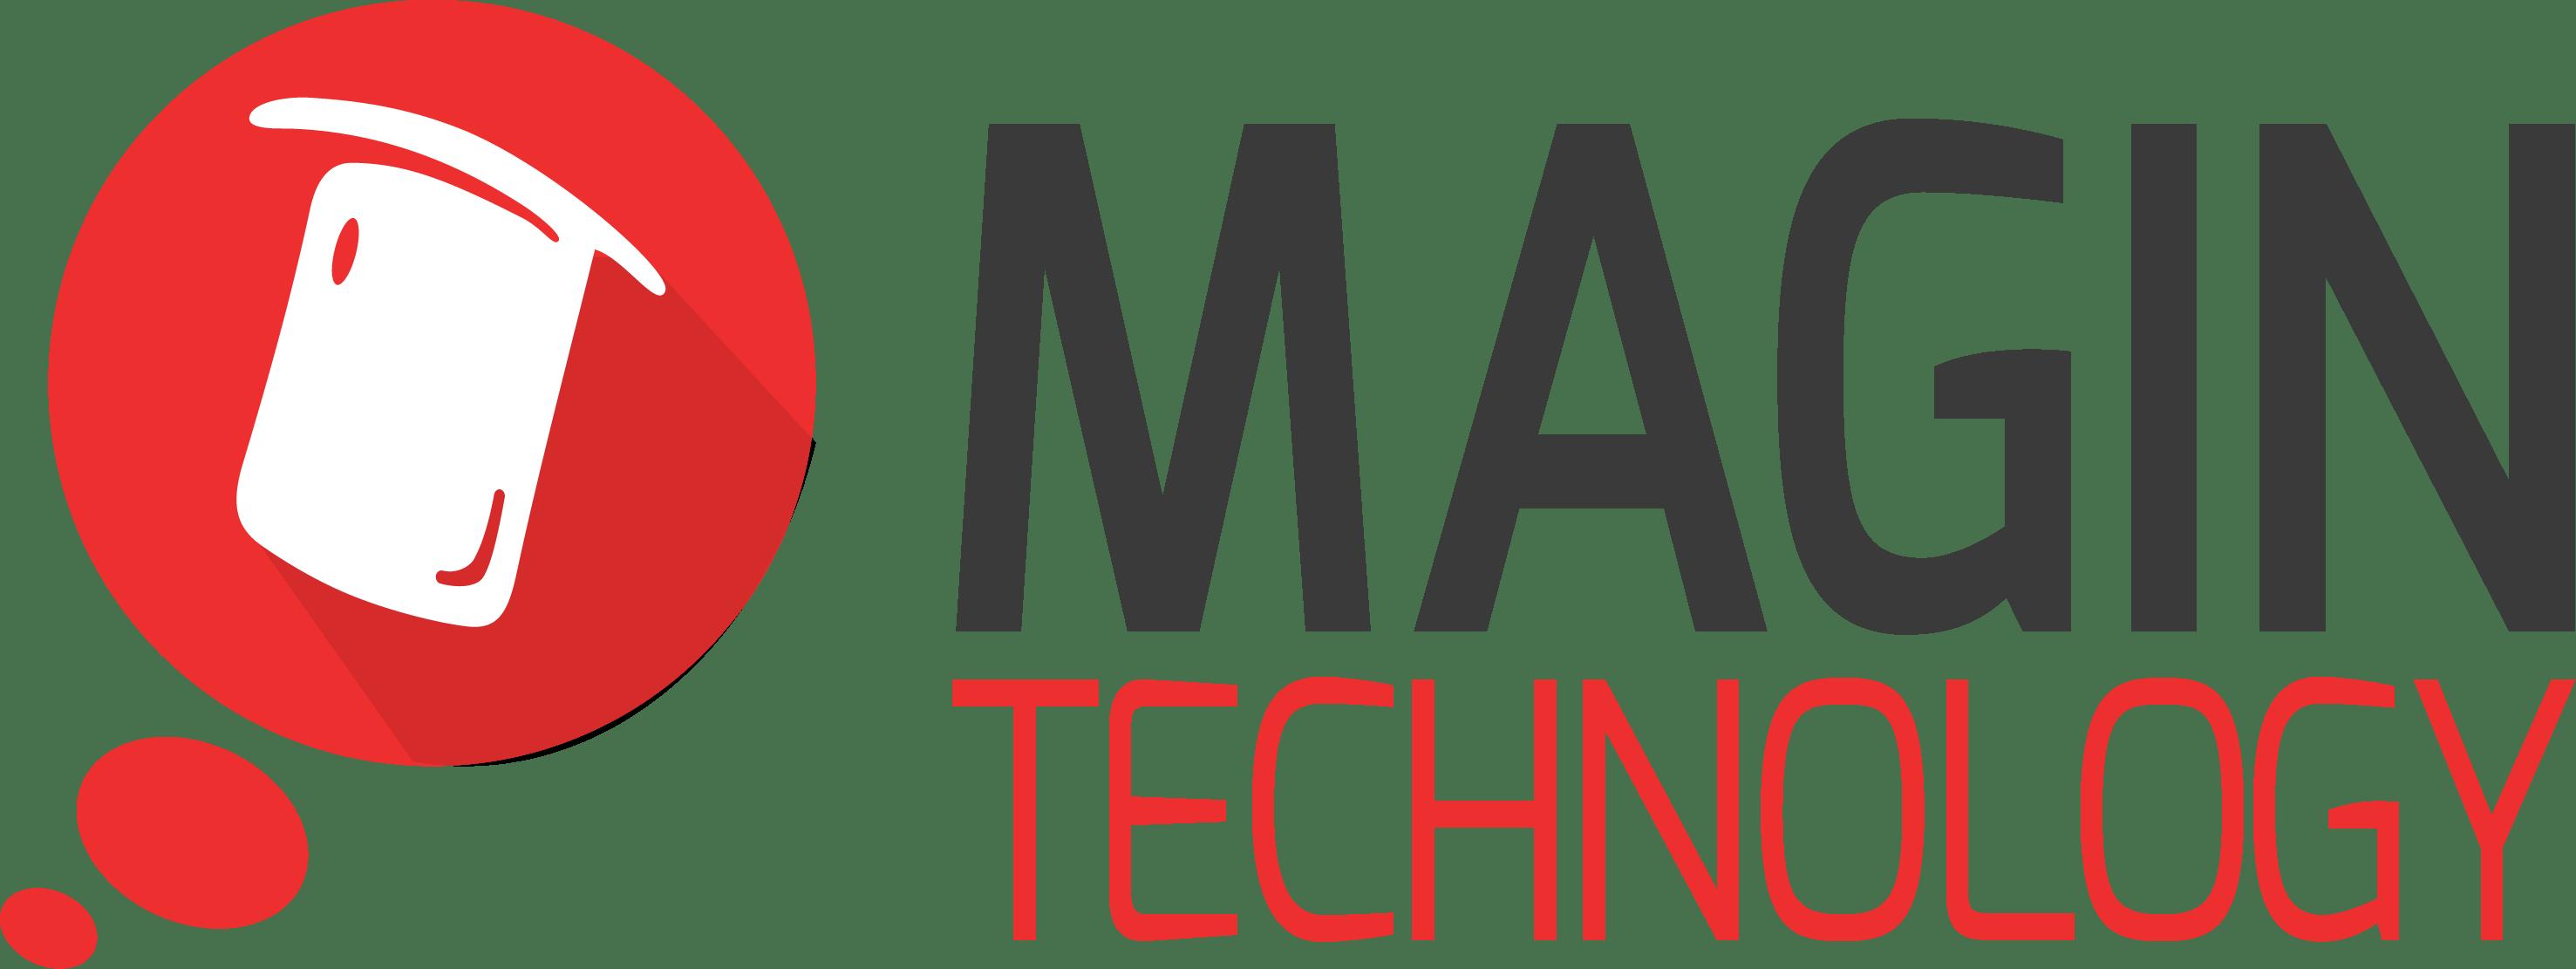 Magin Technology